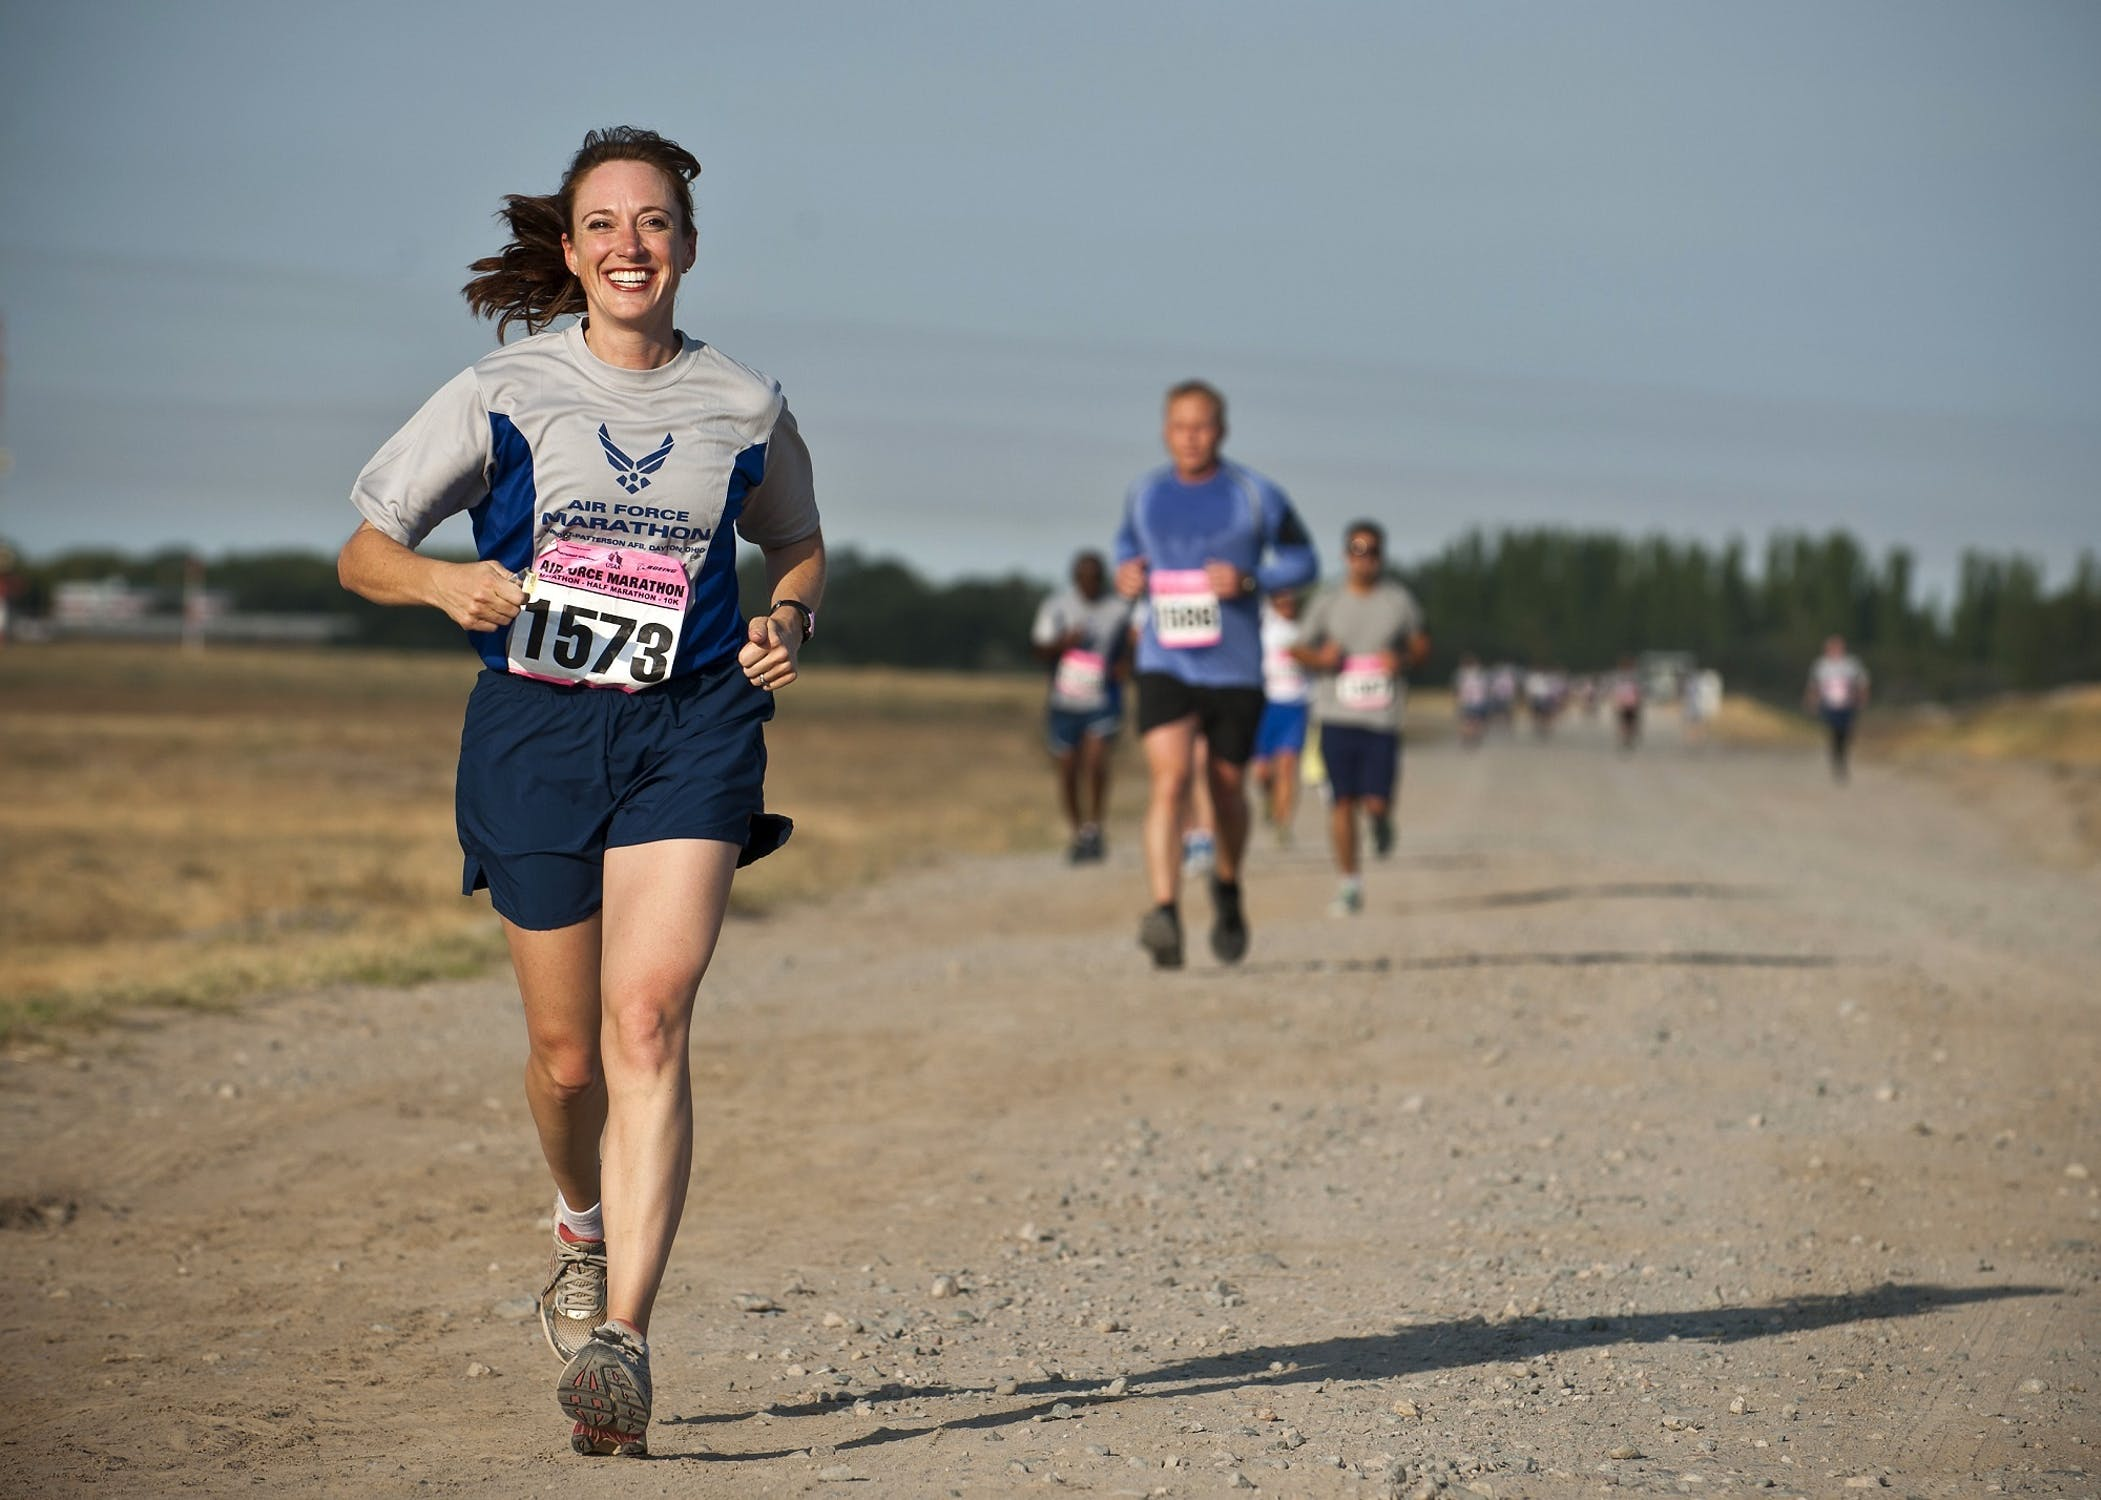 Maraton-løber